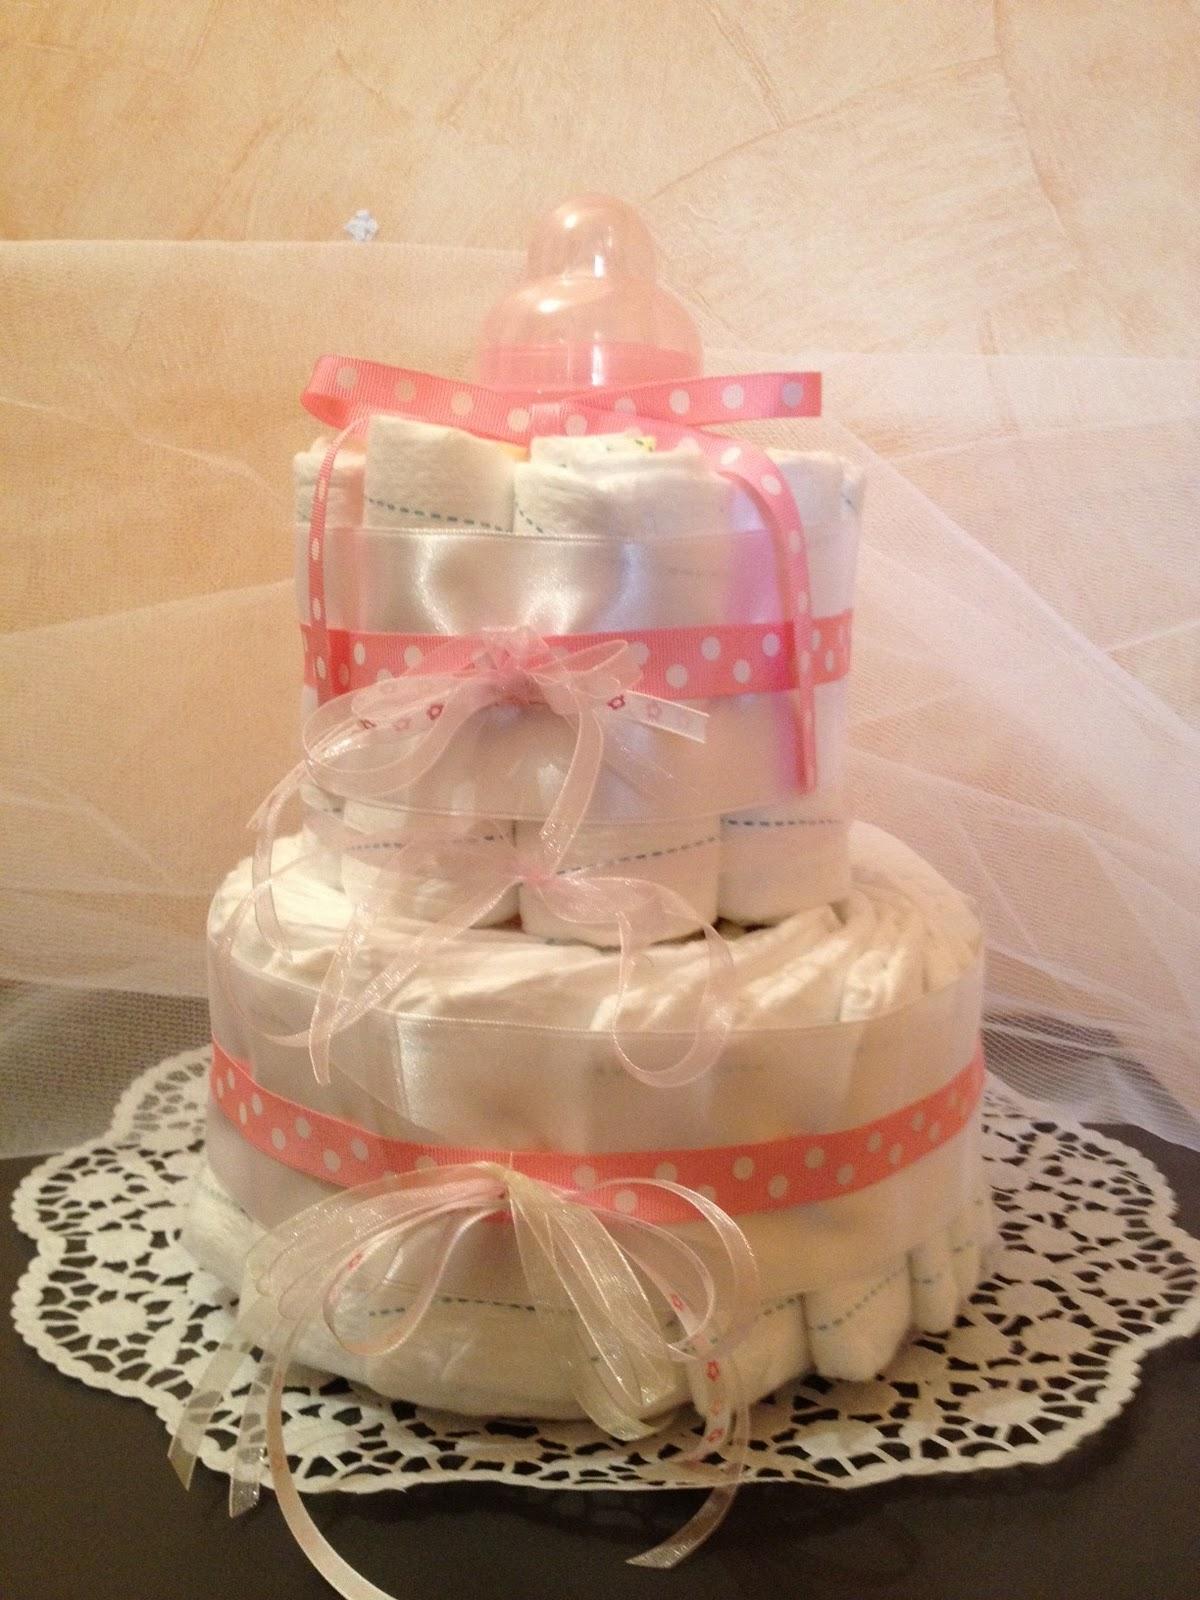 babyshower planner diaper cake confection de gateau de. Black Bedroom Furniture Sets. Home Design Ideas